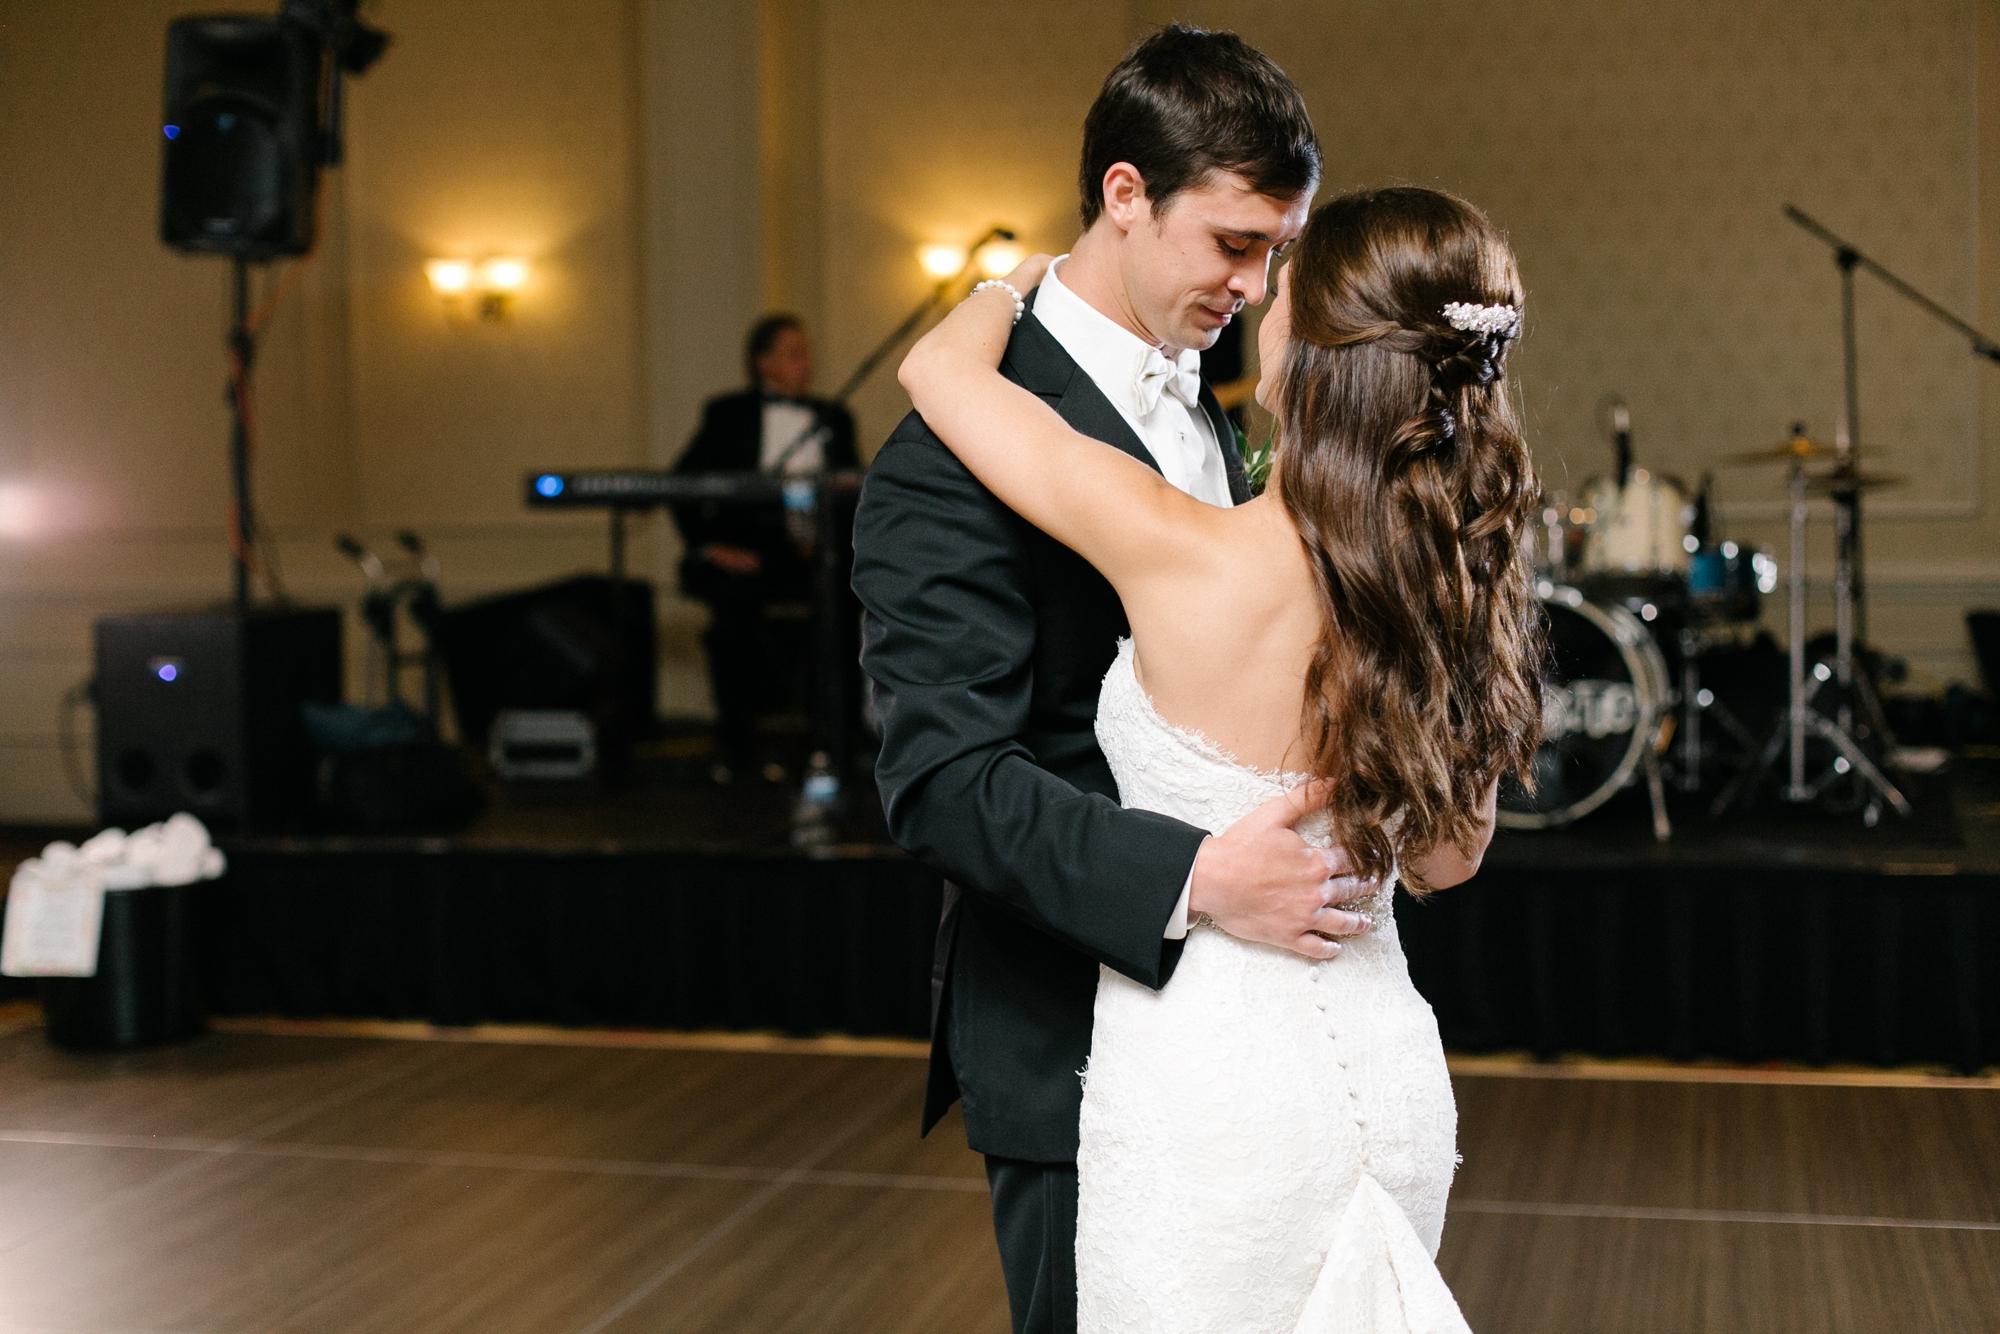 New_Orleans_Wedding_Photographer_1033.jpg